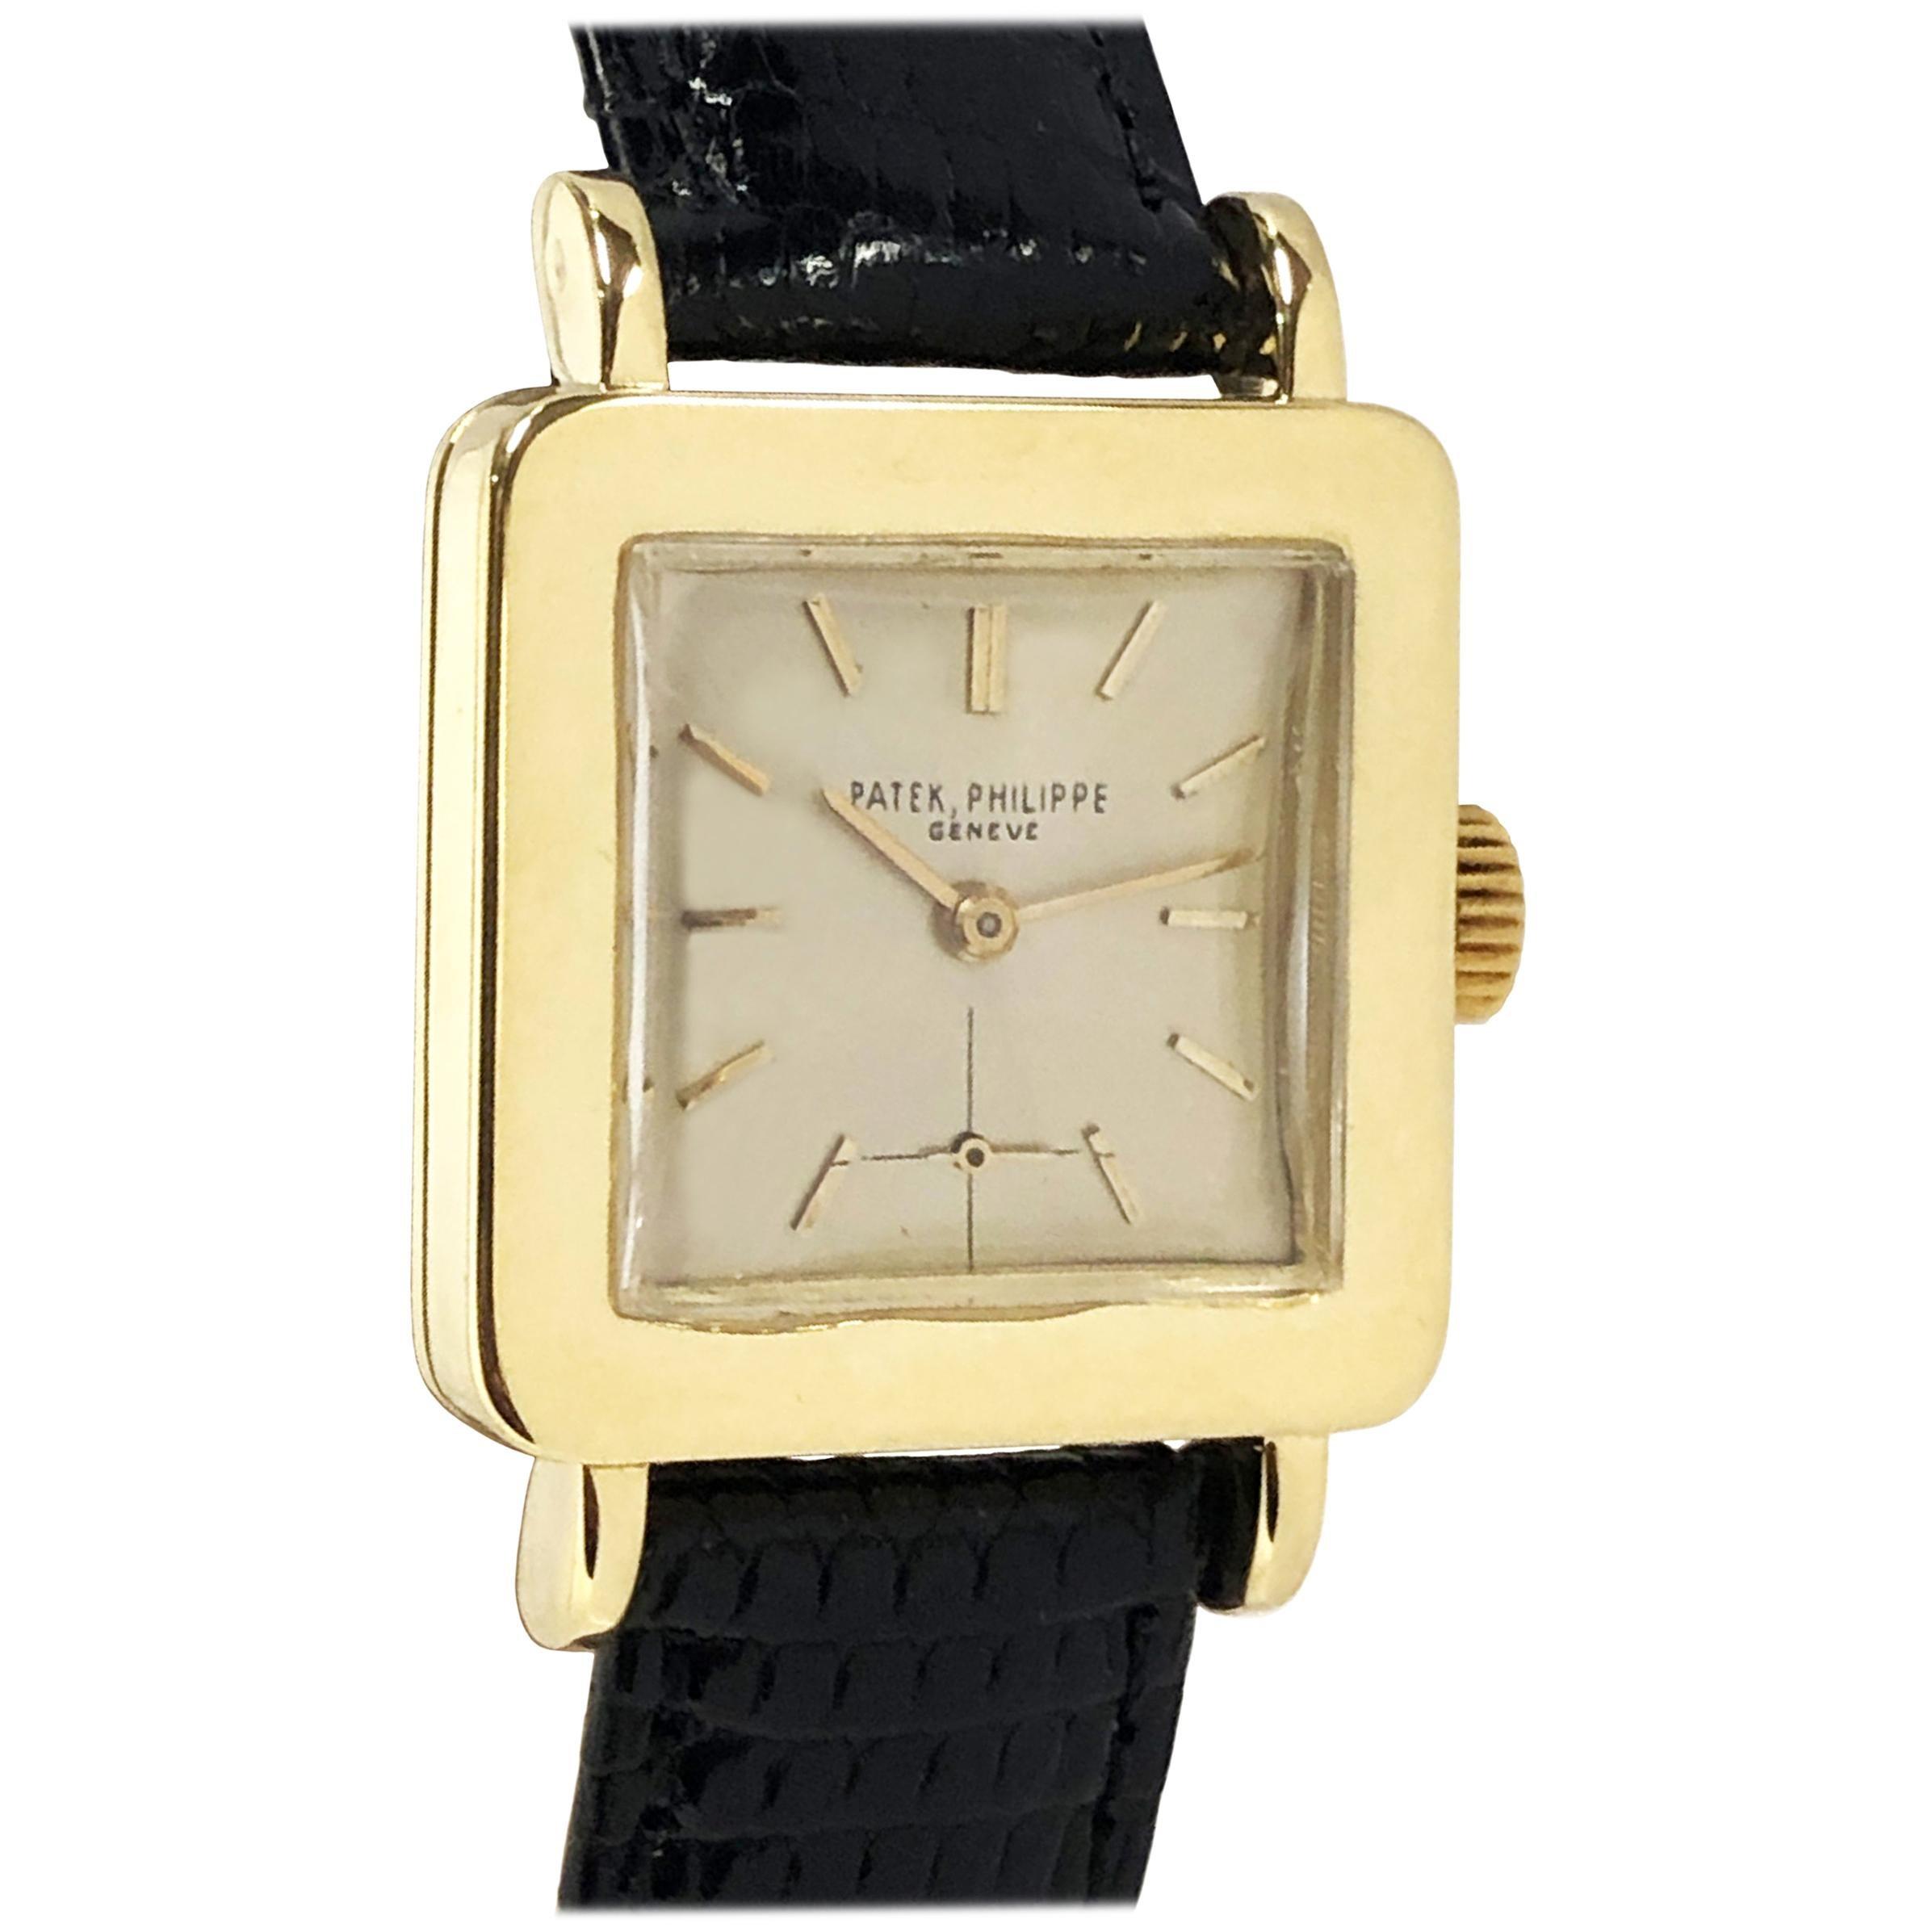 Patek Philippe Ref 2444 Vintage Yellow Gold Mechanical Wristwatch